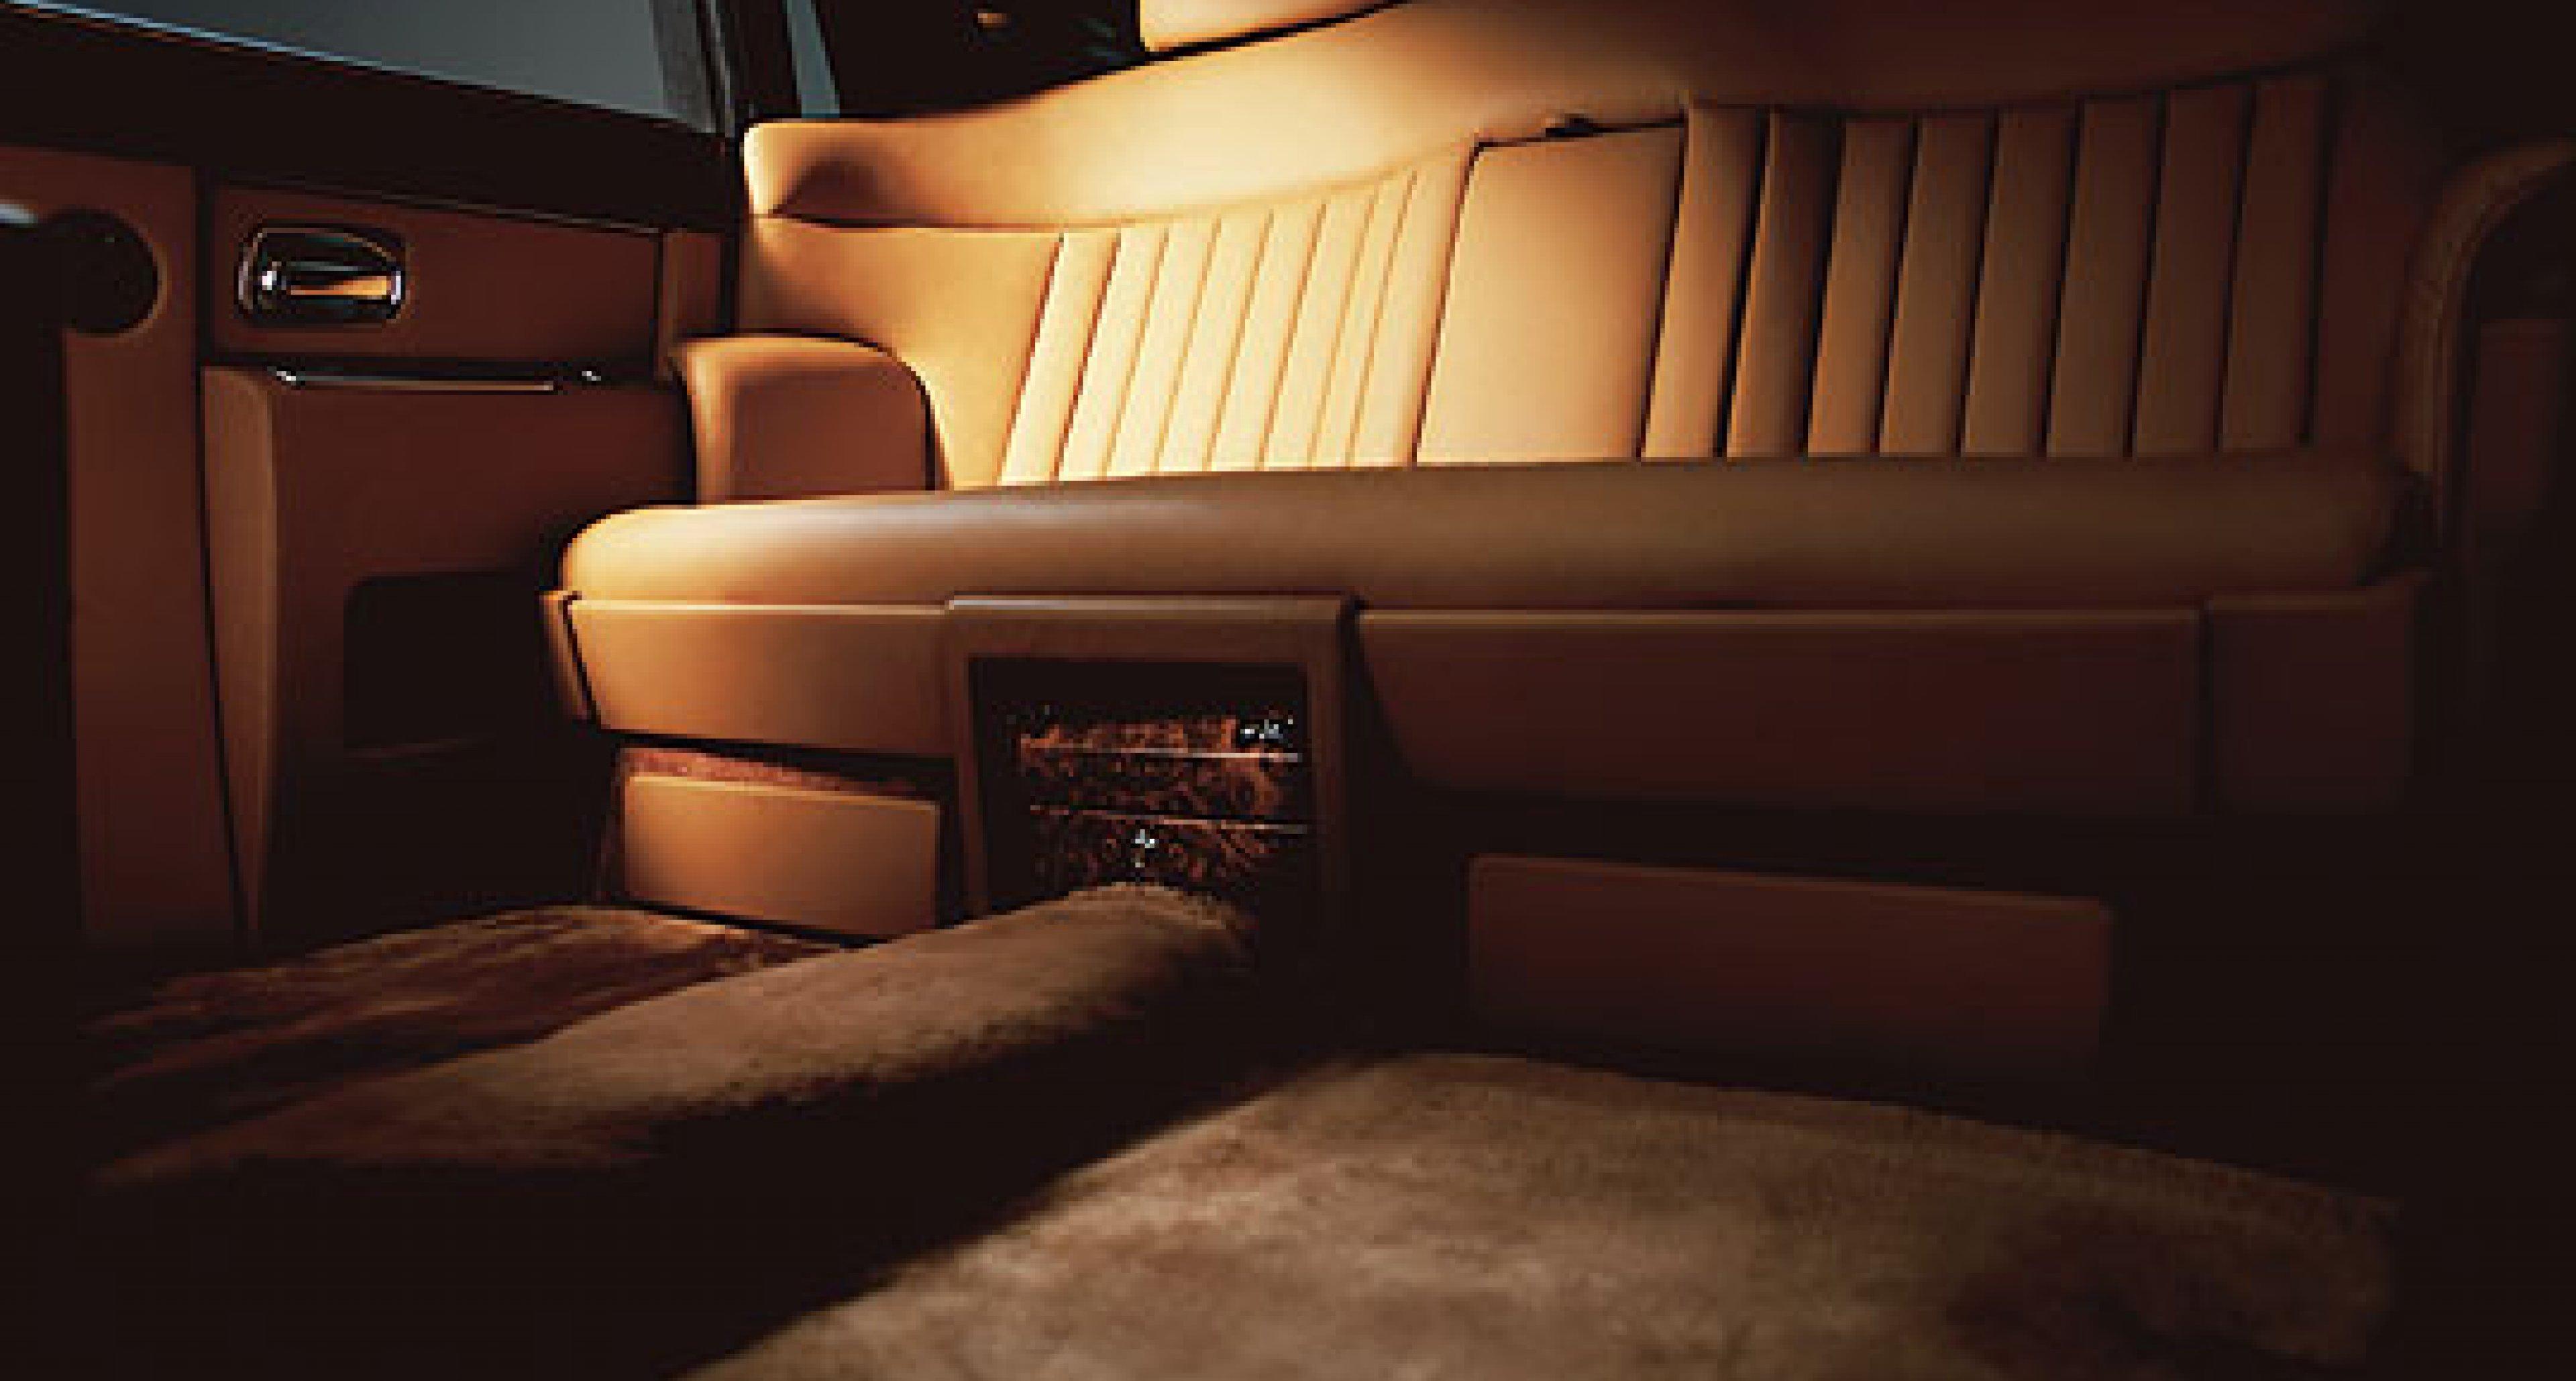 Rolls-Royce Phantom with extended wheelbase